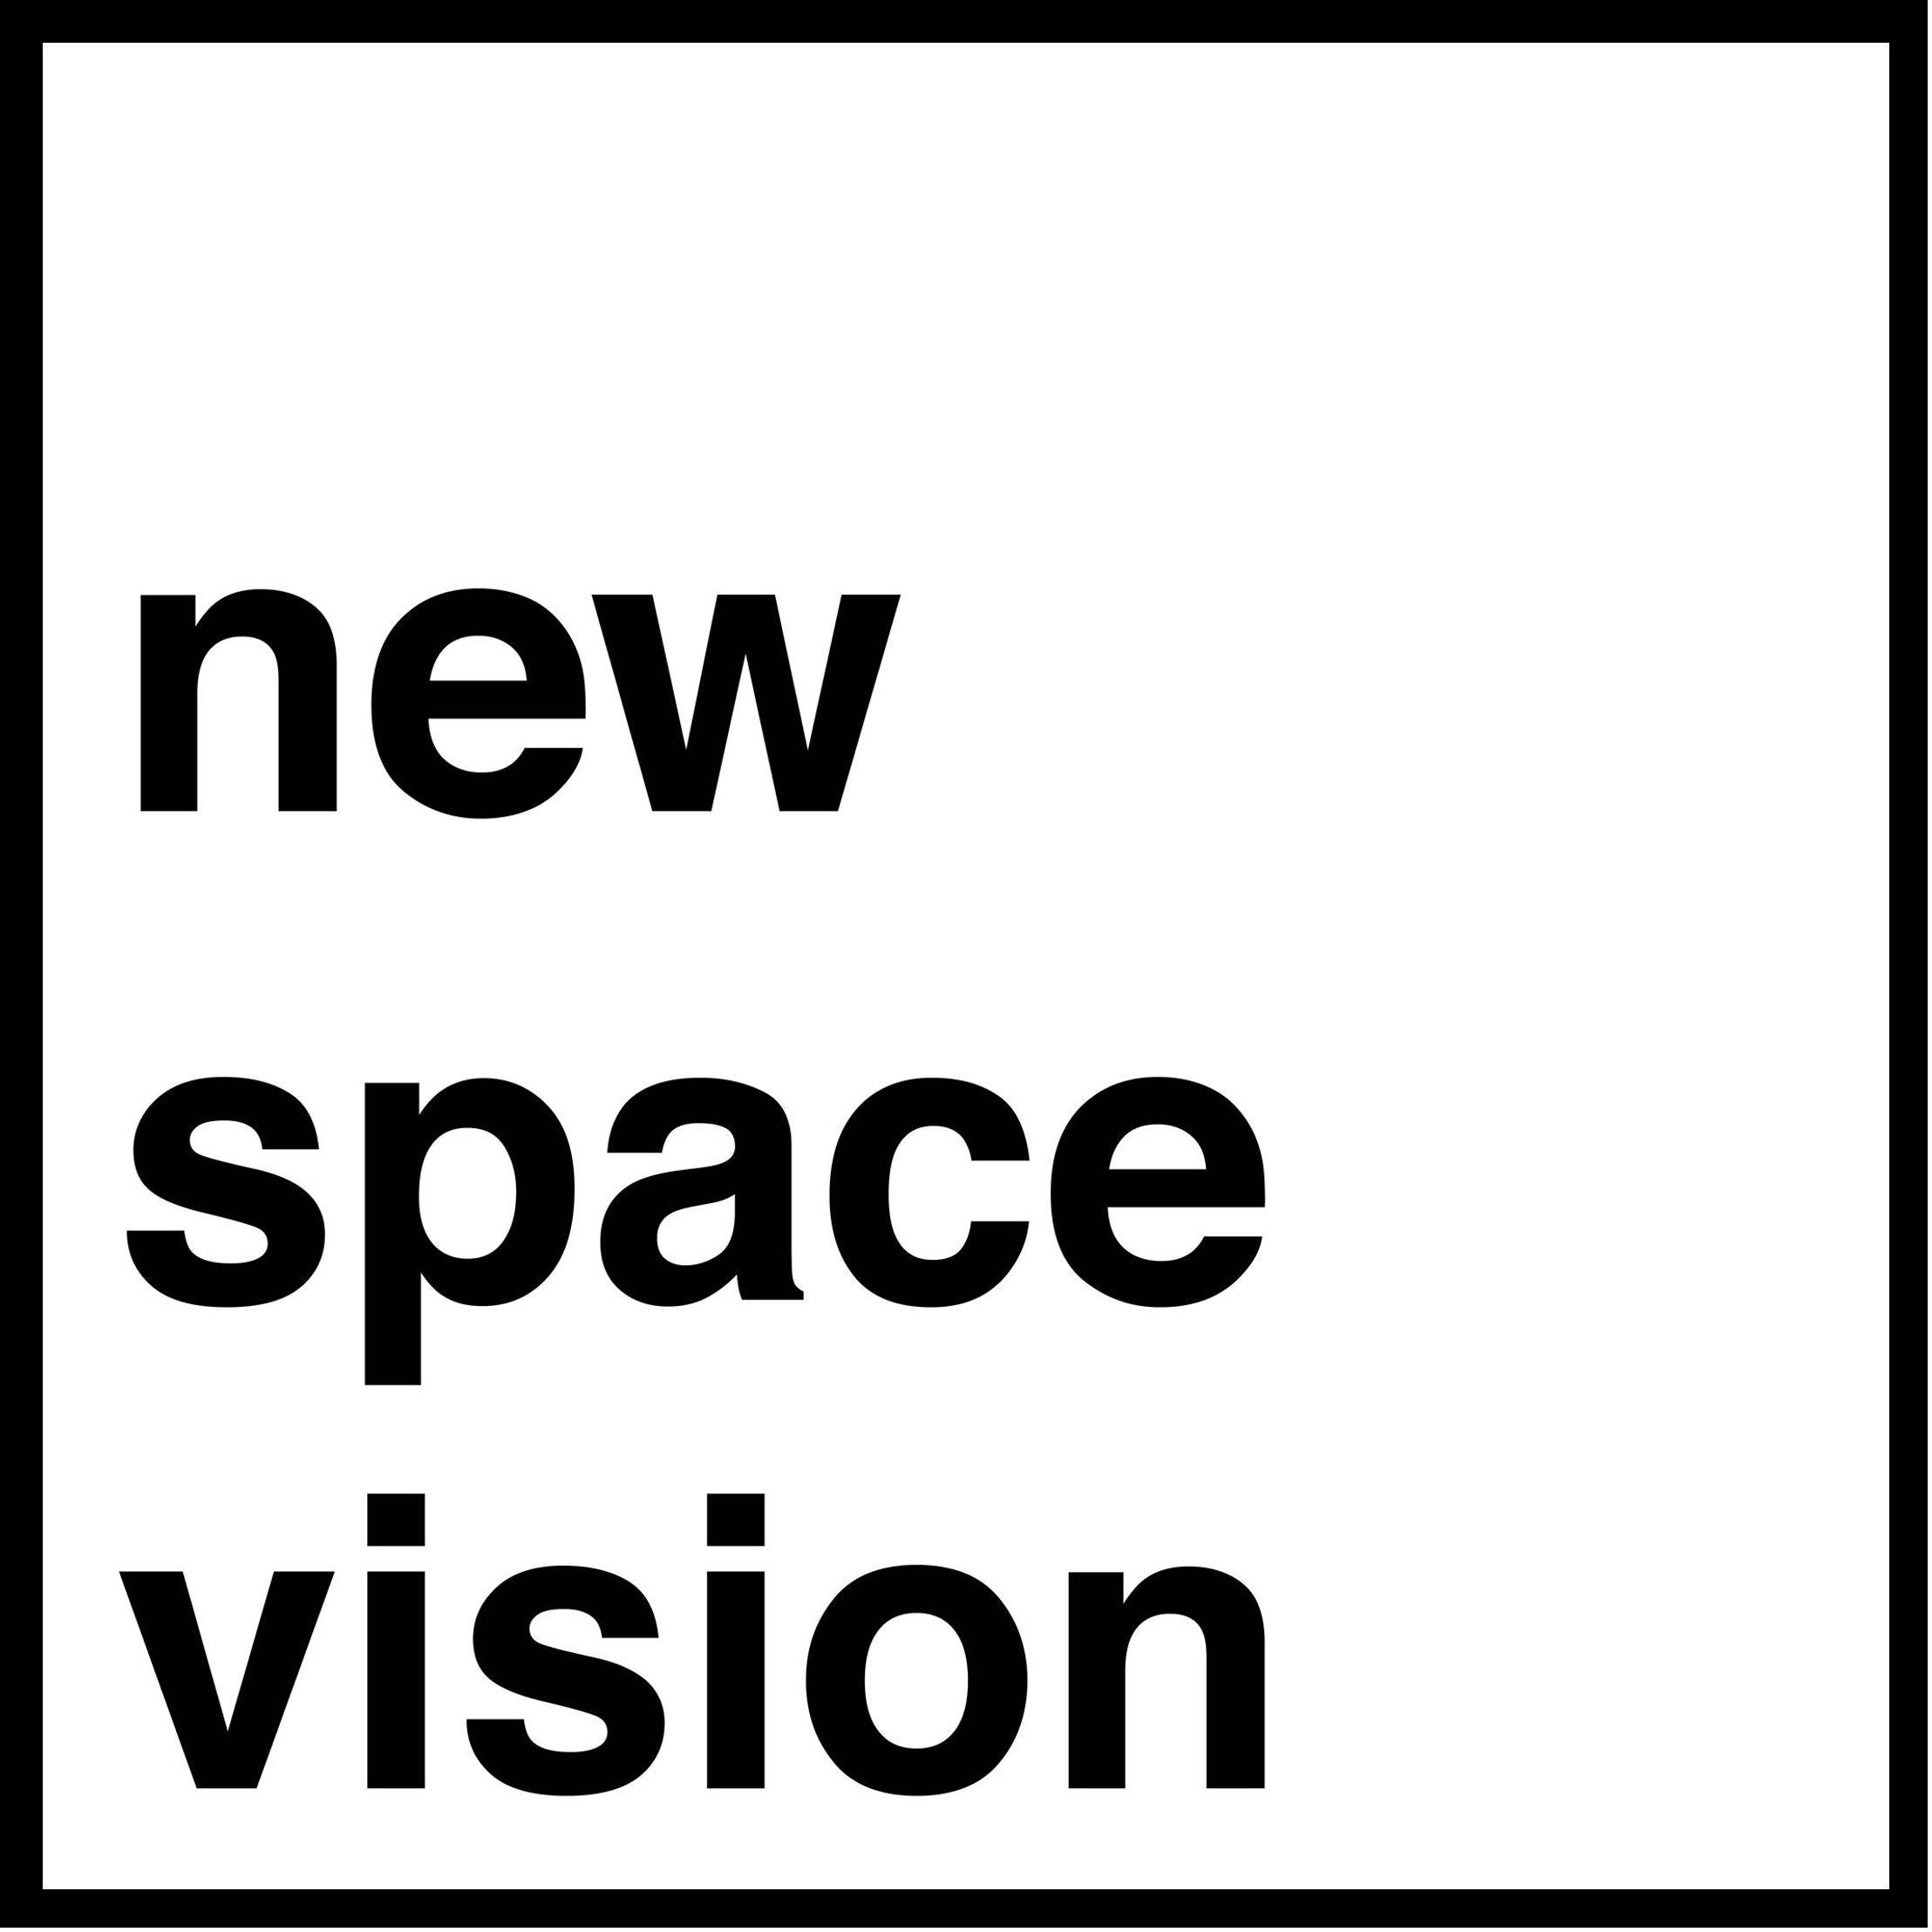 NewSpaceVision